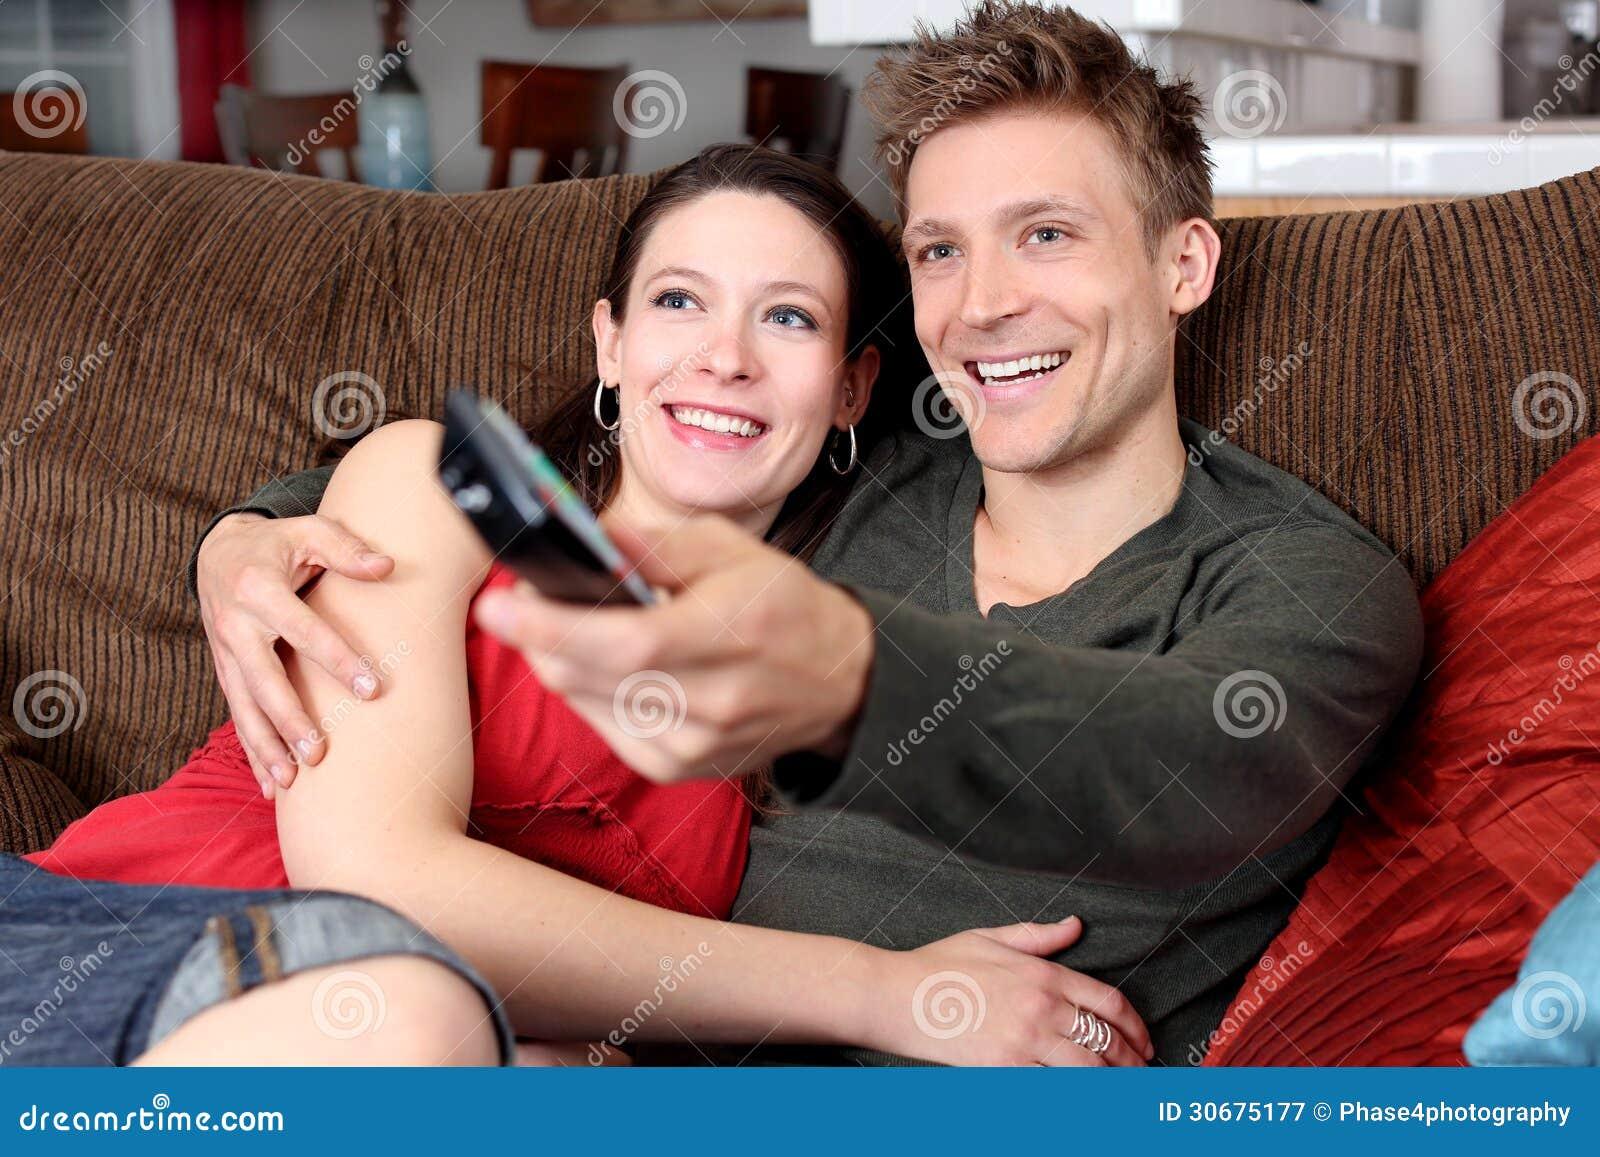 Cuddling Watching Tv Couple watching tvCouple Cuddling Watching Tv